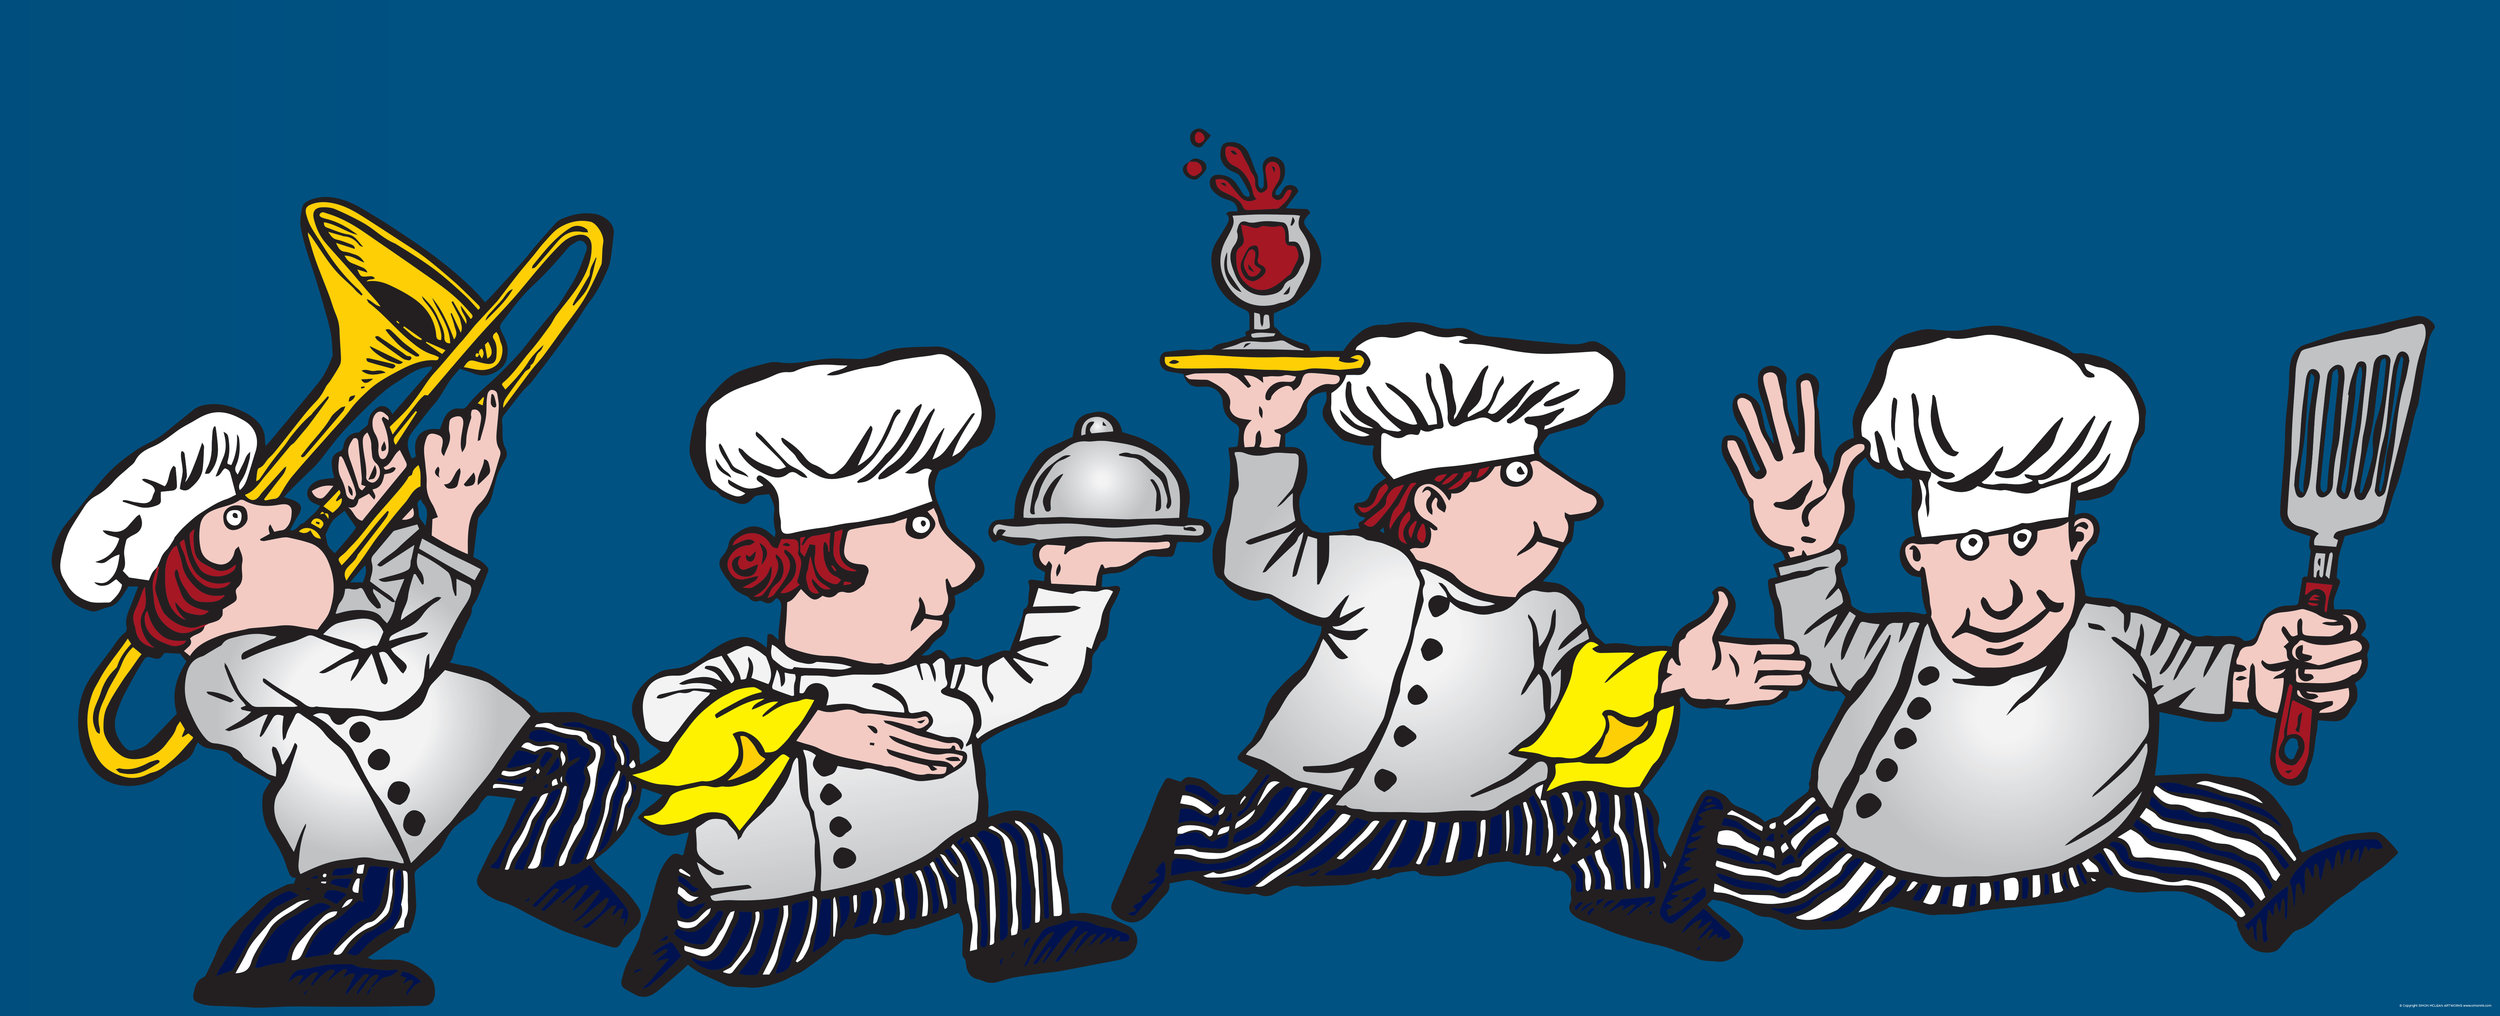 Chefs L Enterance copy.jpg